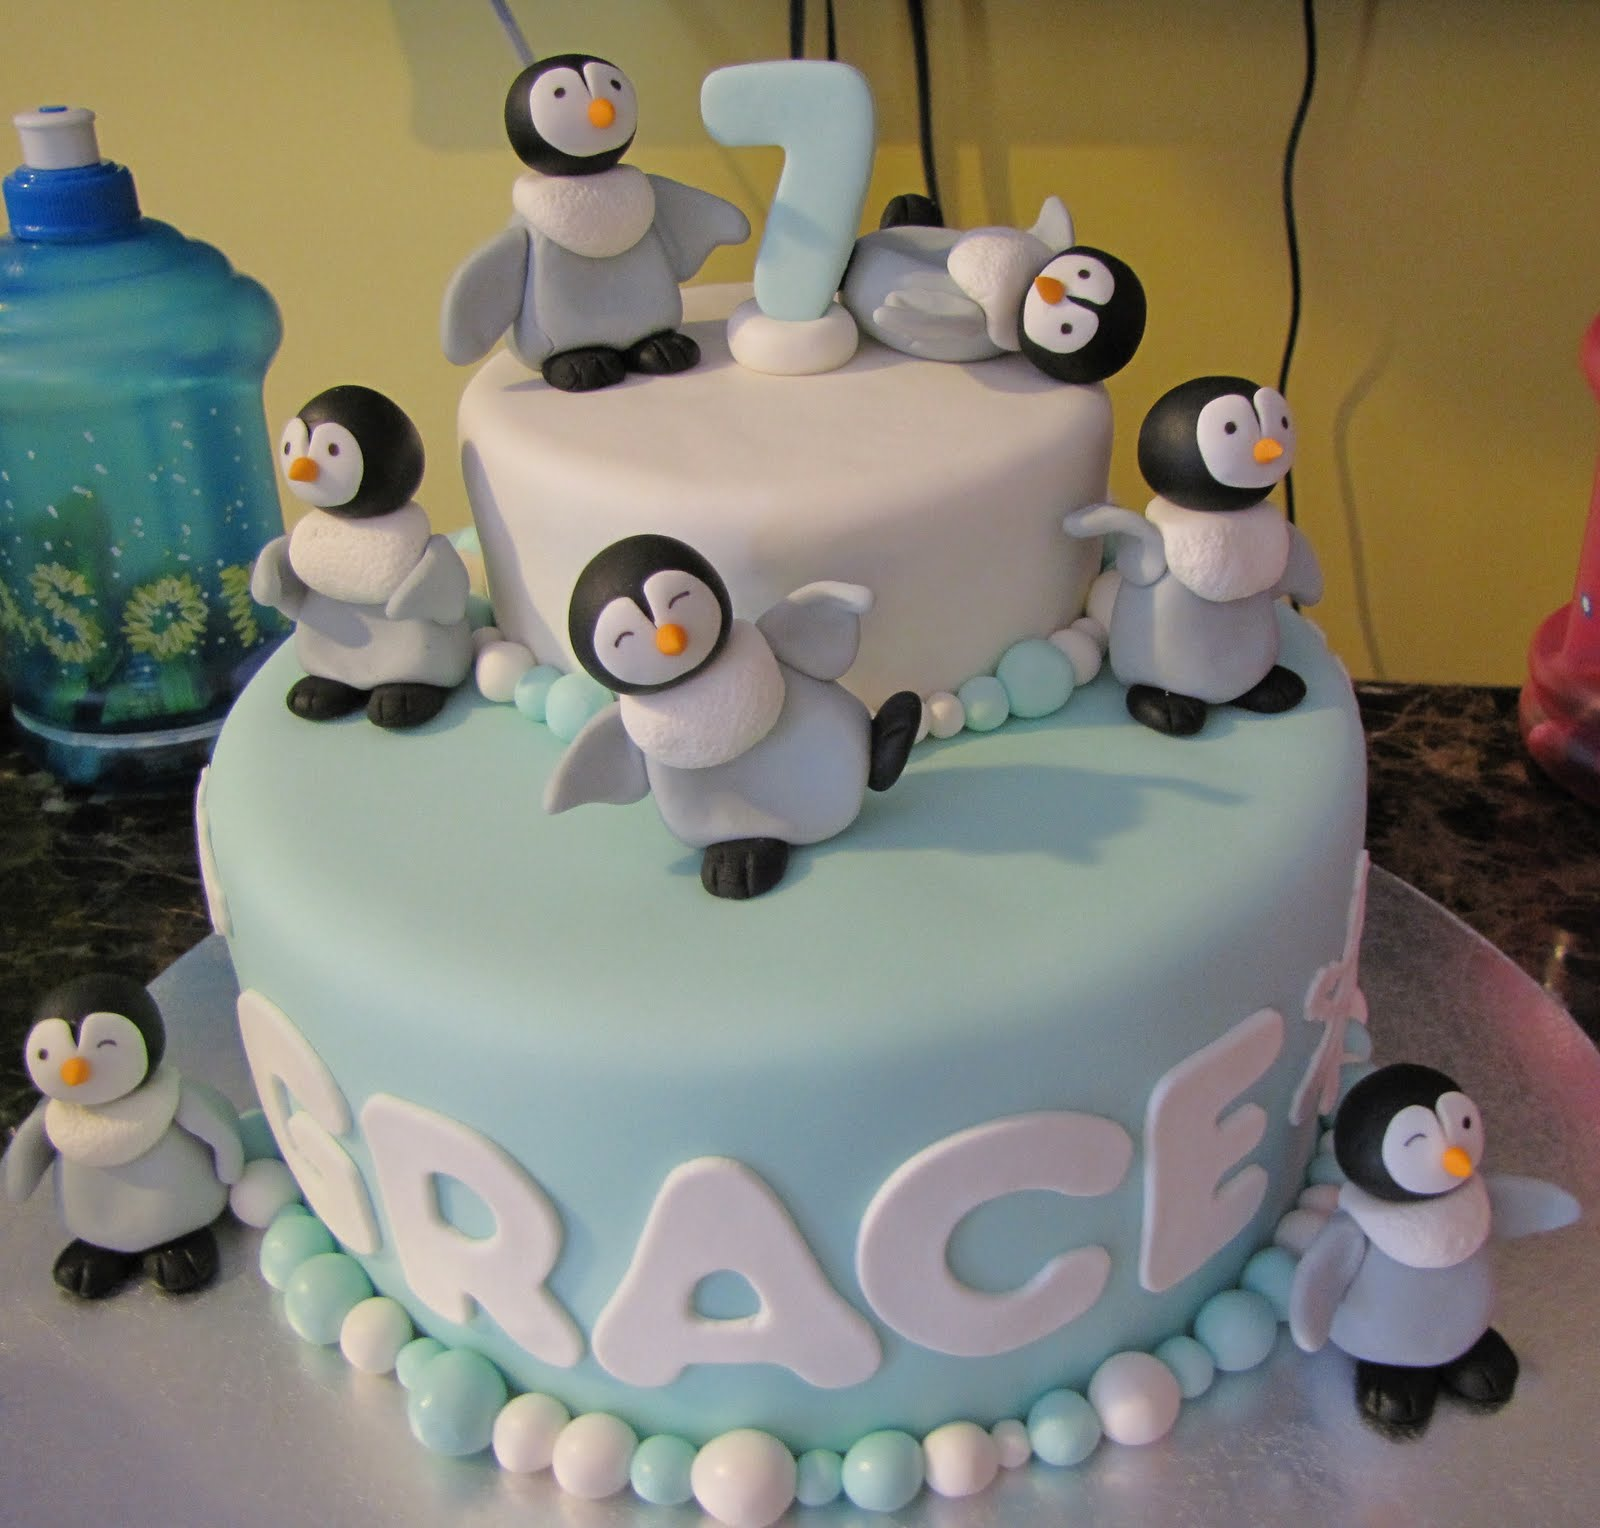 Birthday Cakes For You Penguin Cake